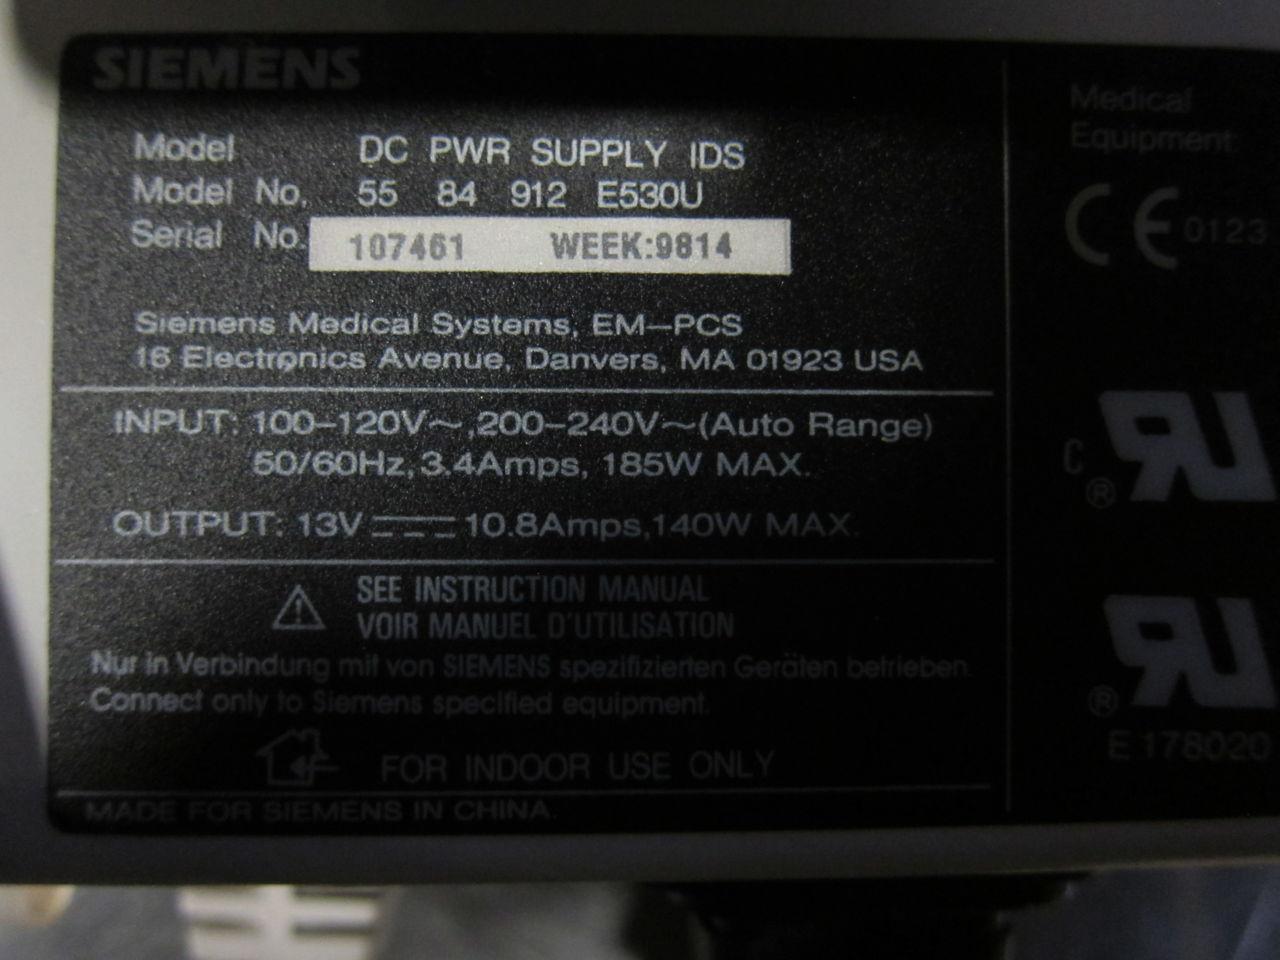 SIEMENS DC Pwr Supply IDS Power Supply